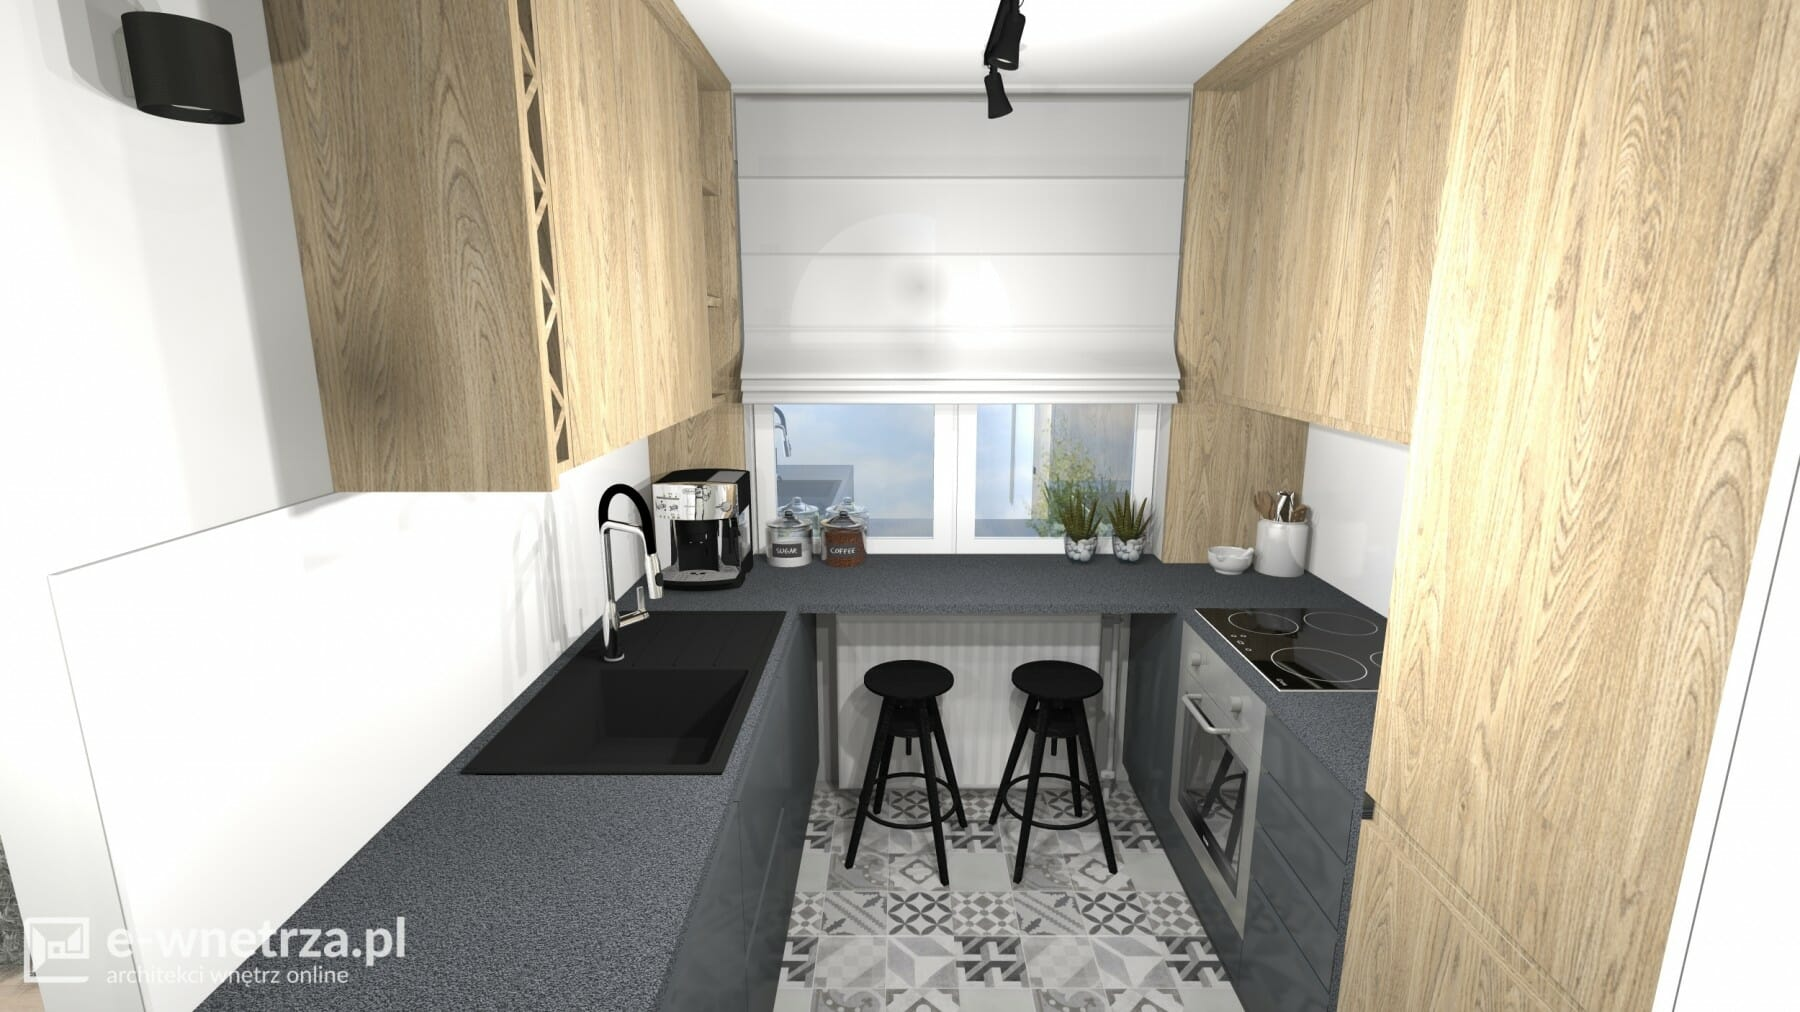 Projekt Salonu Projekt Kuchni Projekty E Wnetrza Pl